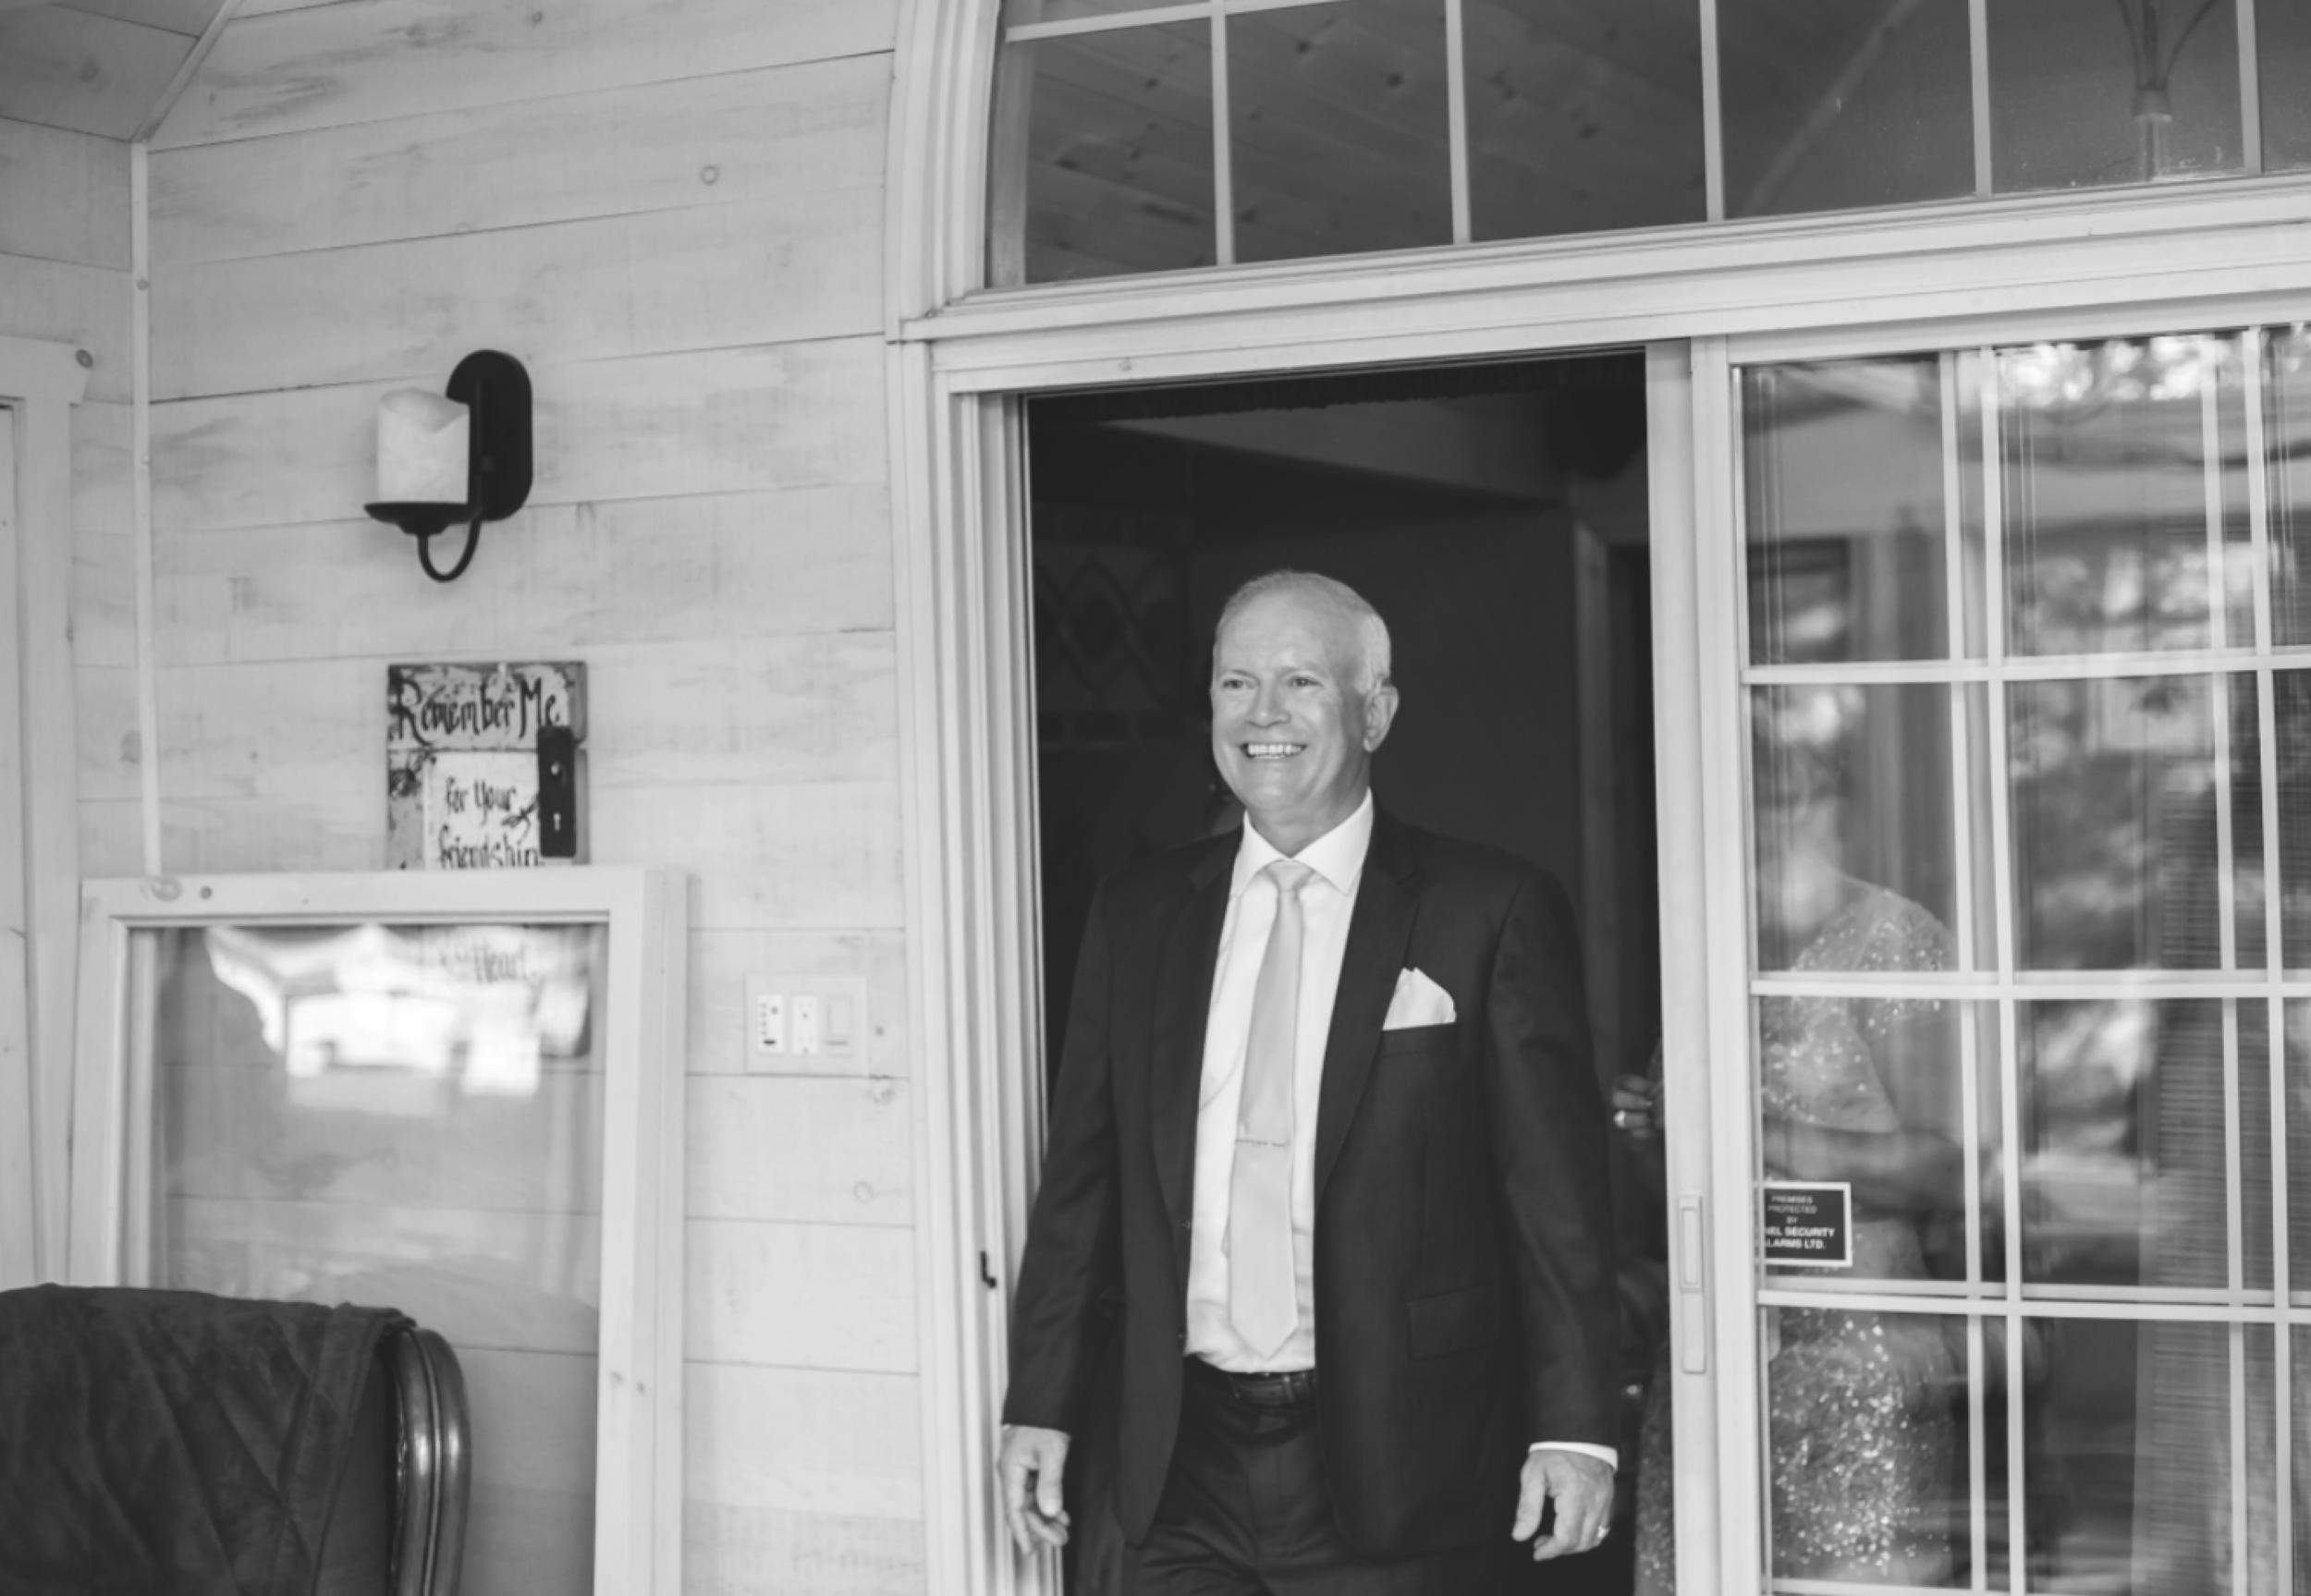 Wedding-Photos-Muskoka-Clevelands-House-Photographer-Wedding-Hamilton-GTA-Niagara-Oakville-Moments-by-Lauren-Photography-Photo-Image-7.png